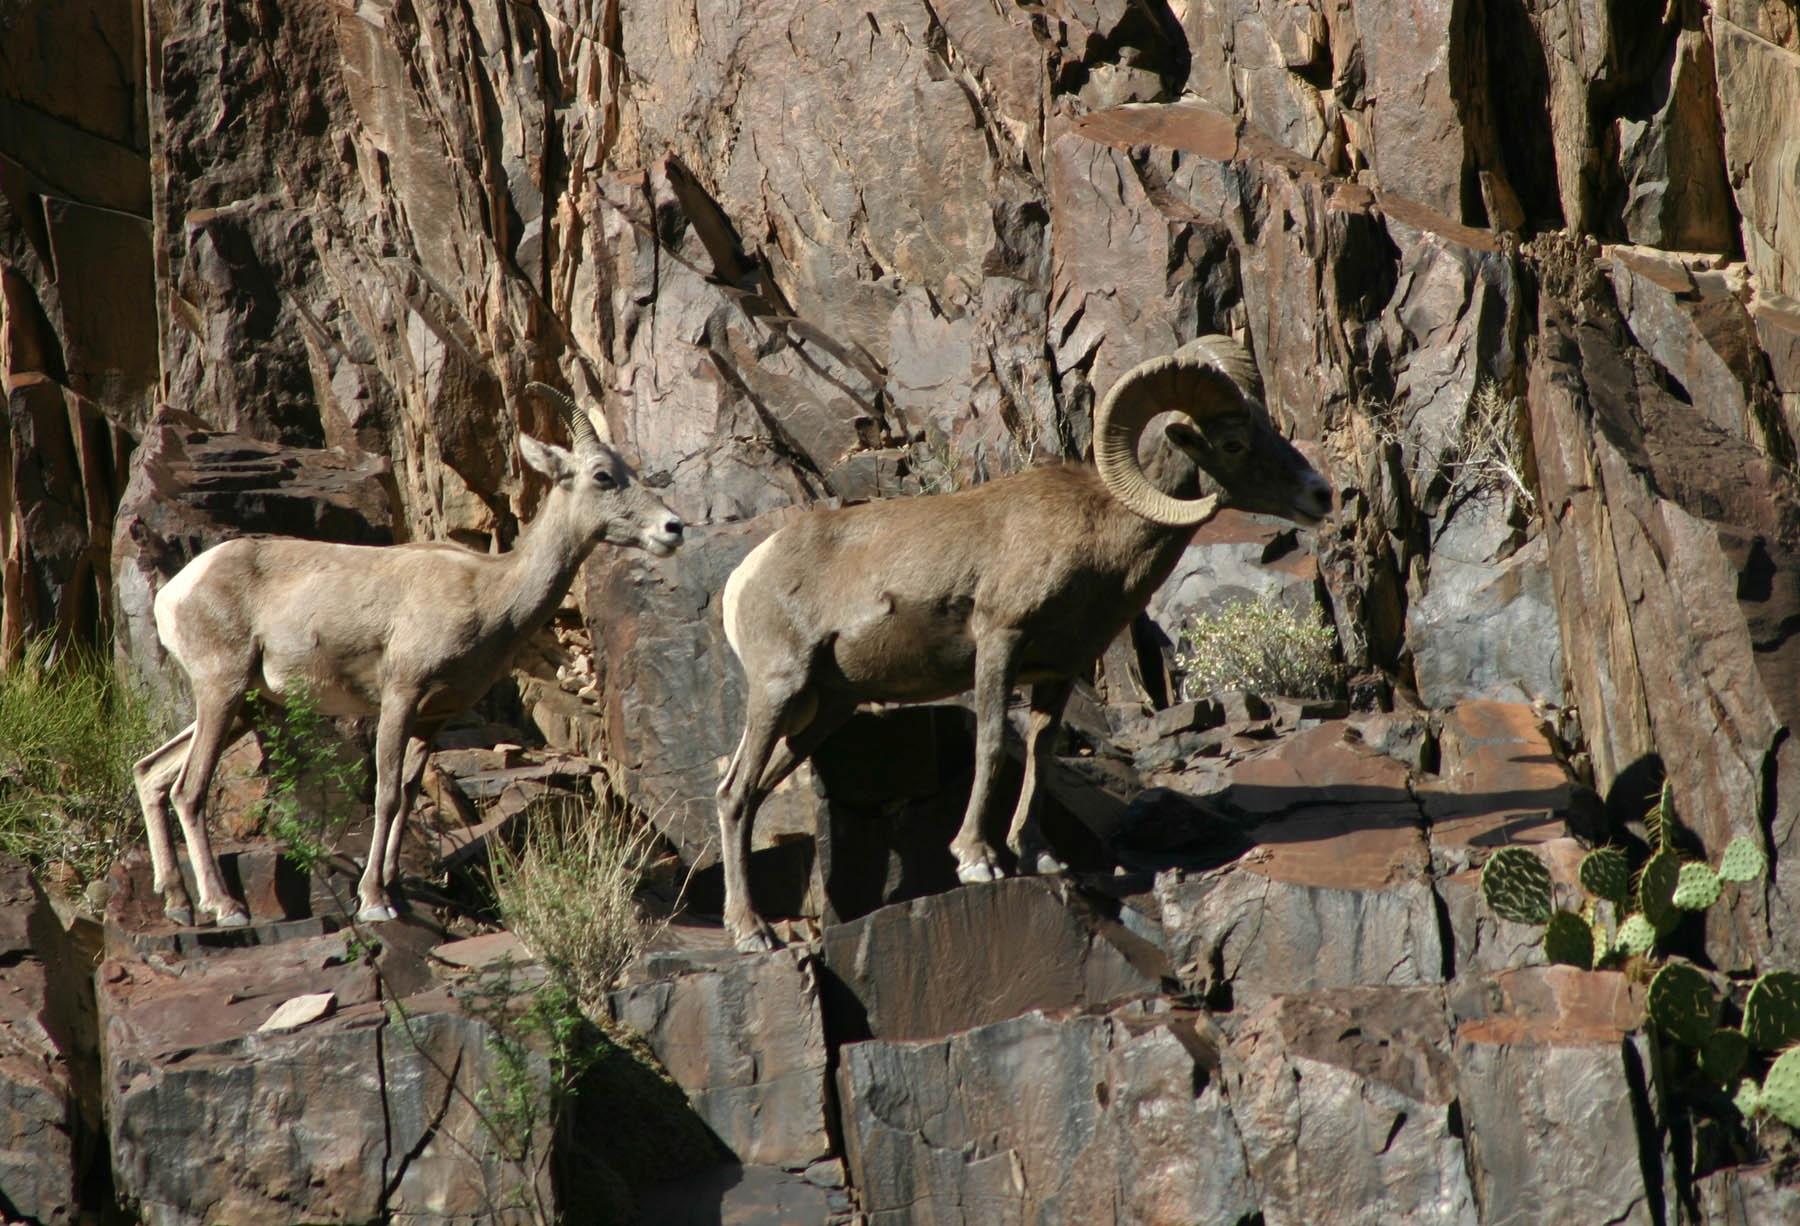 Photo Gallery (U.S. National Park Service